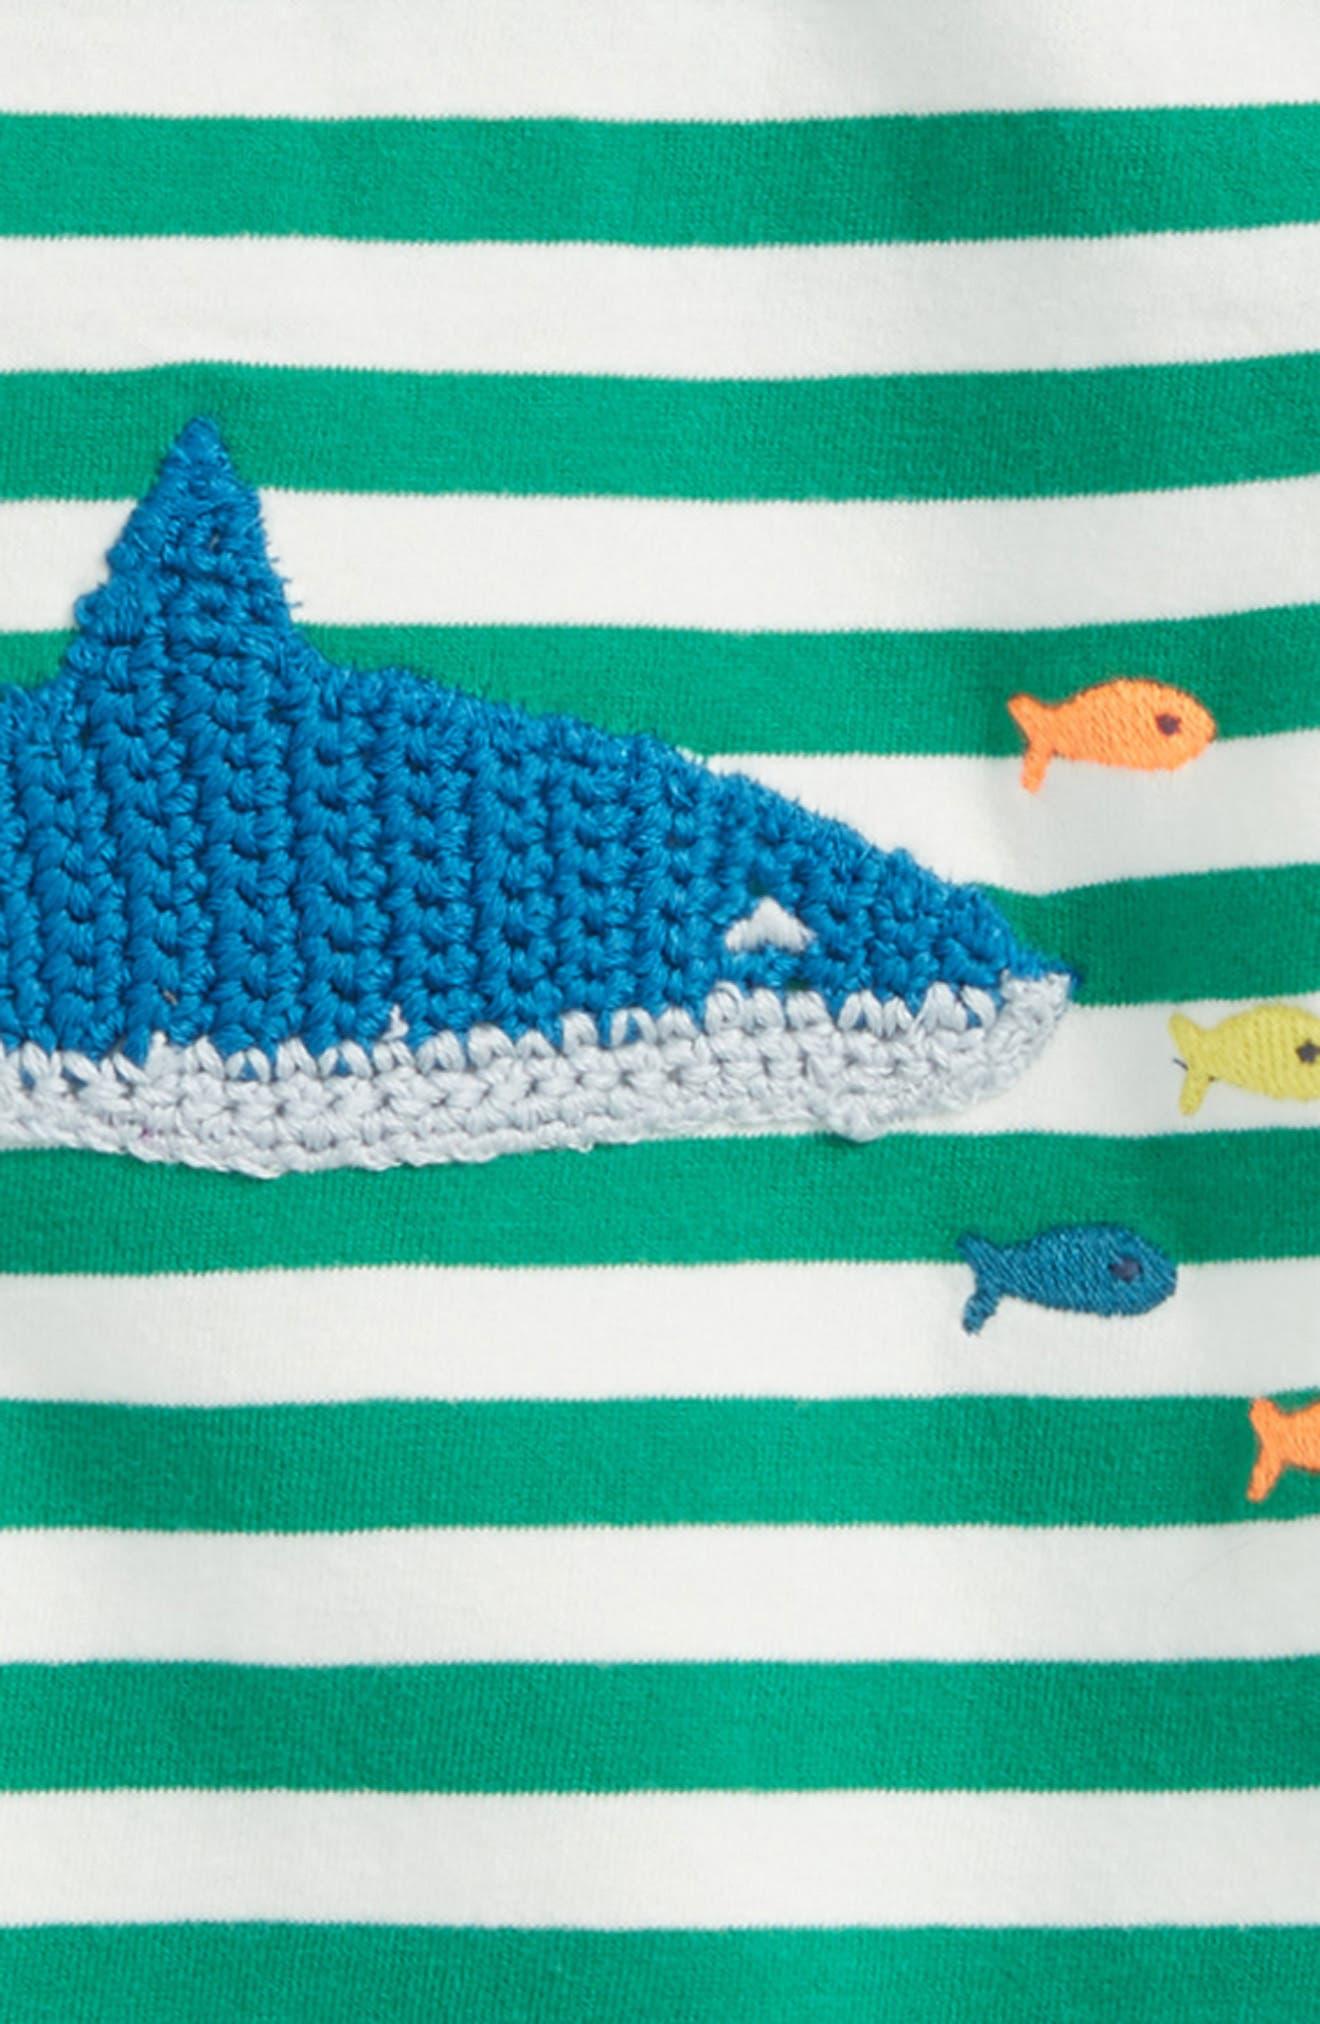 Stripy Crochet Appliqué T-Shirt,                             Alternate thumbnail 2, color,                             Ecru/ Watercress